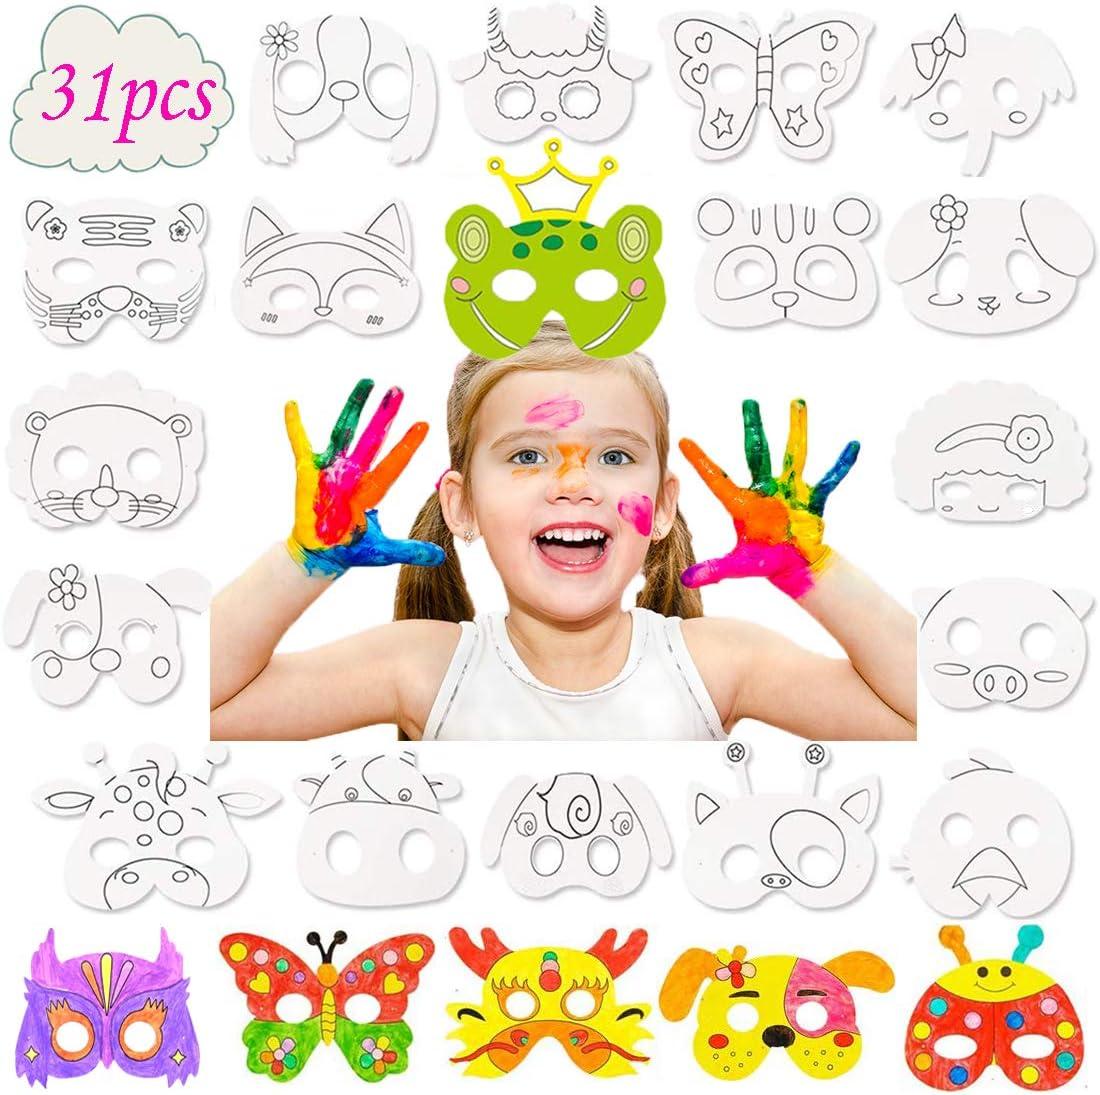 Amazon Promo Code for 32 Pcs Animal Masks for Kids